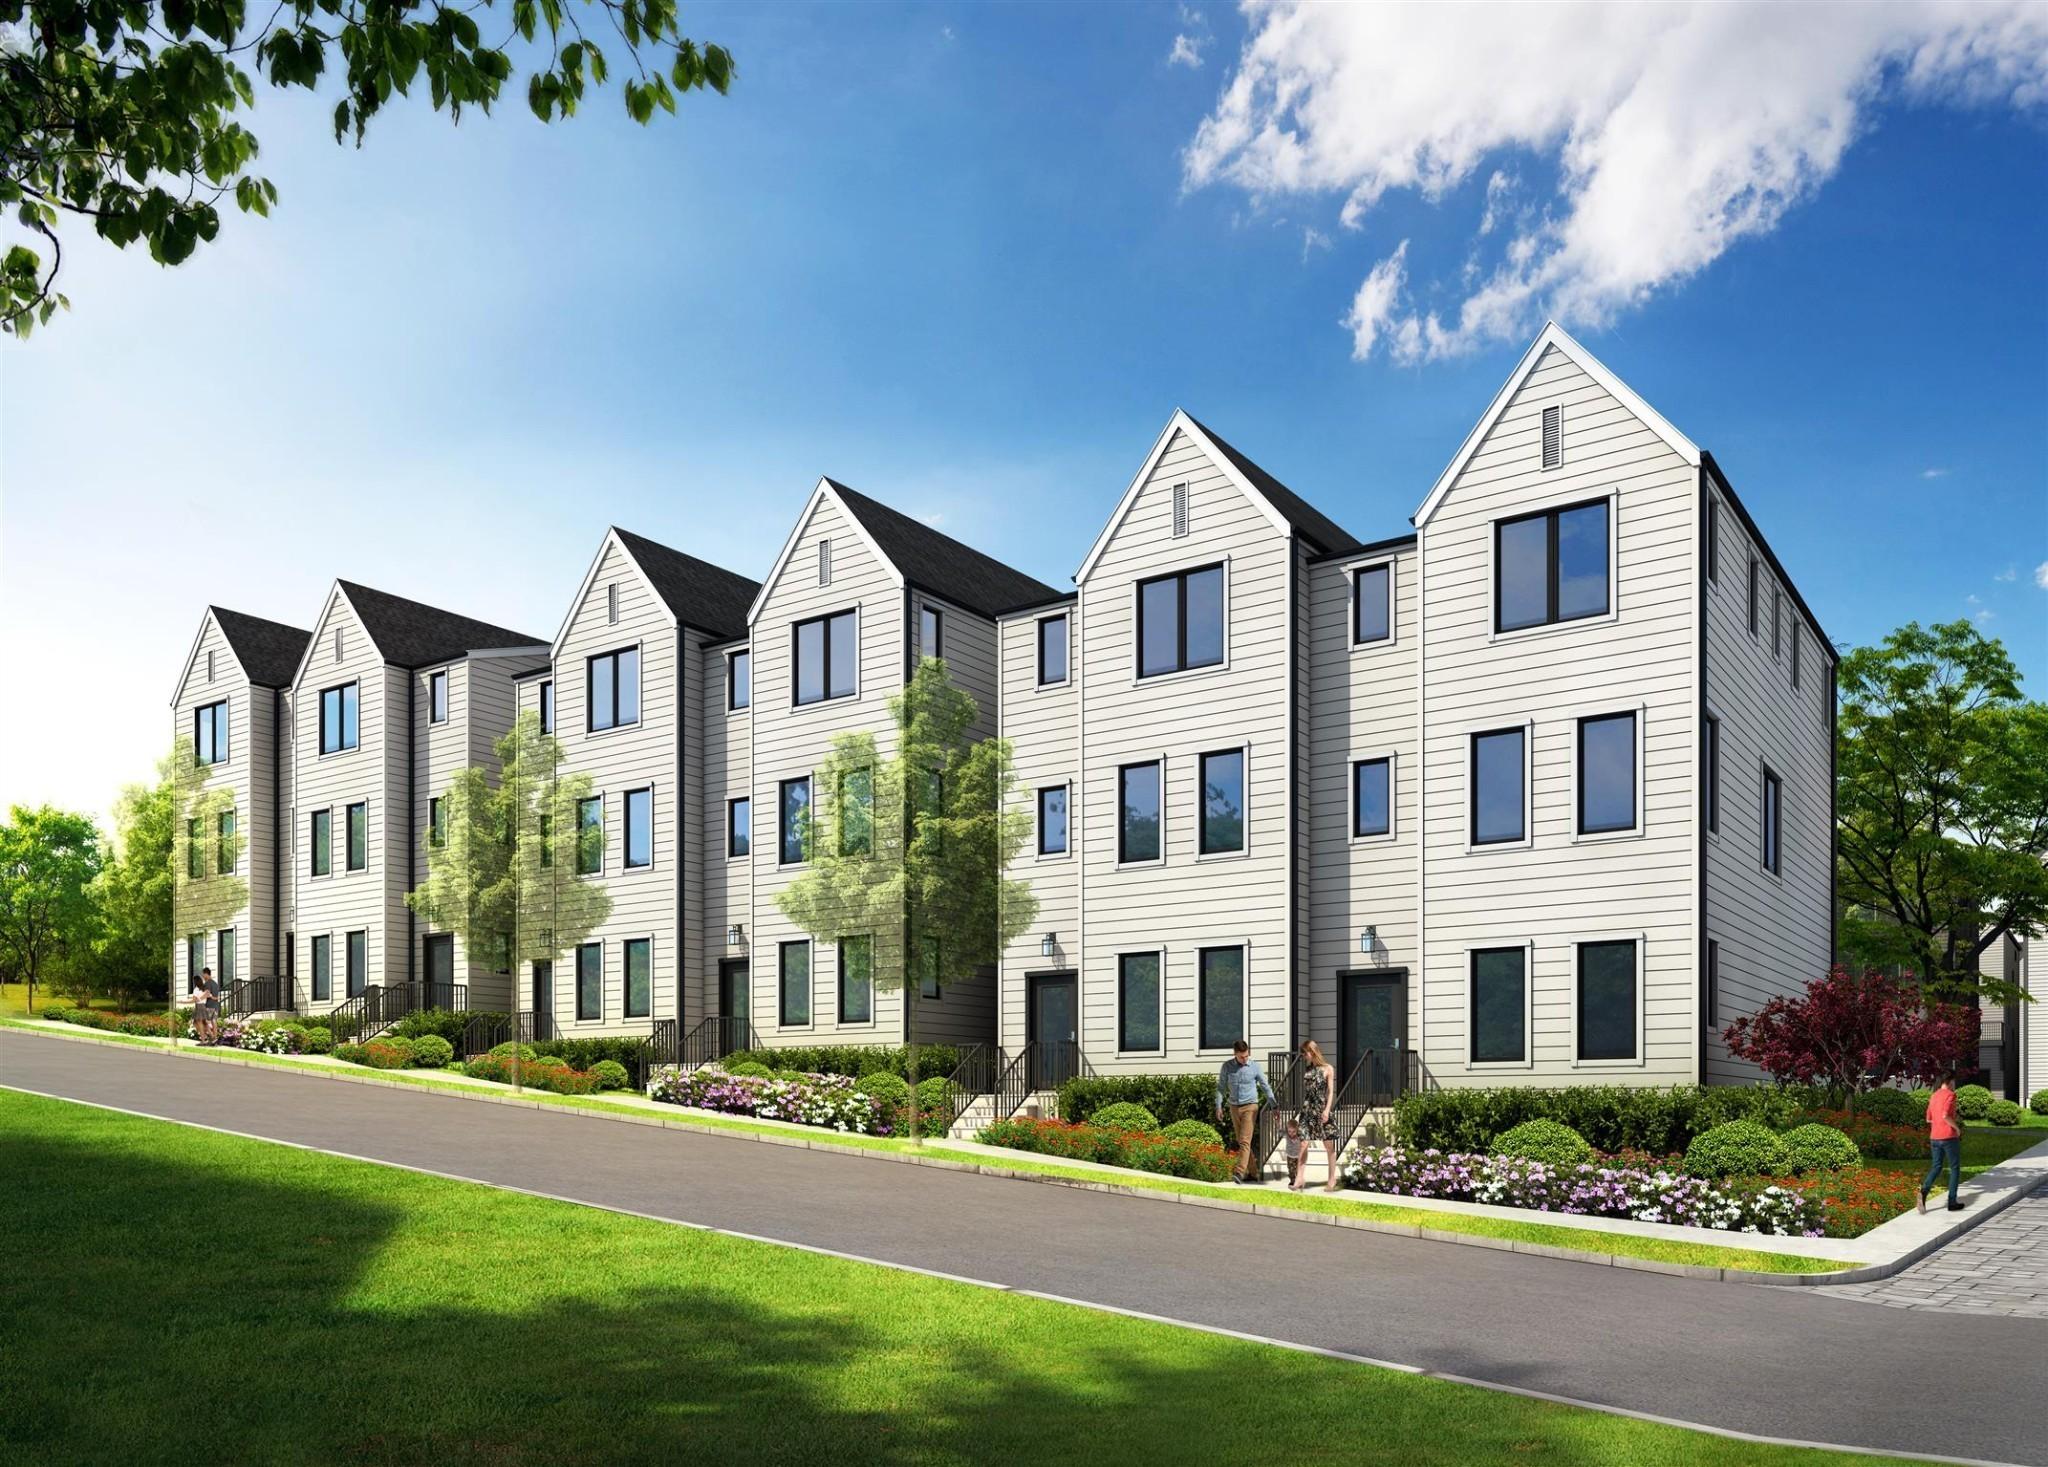 209 Sterling St Property Photo - Nashville, TN real estate listing